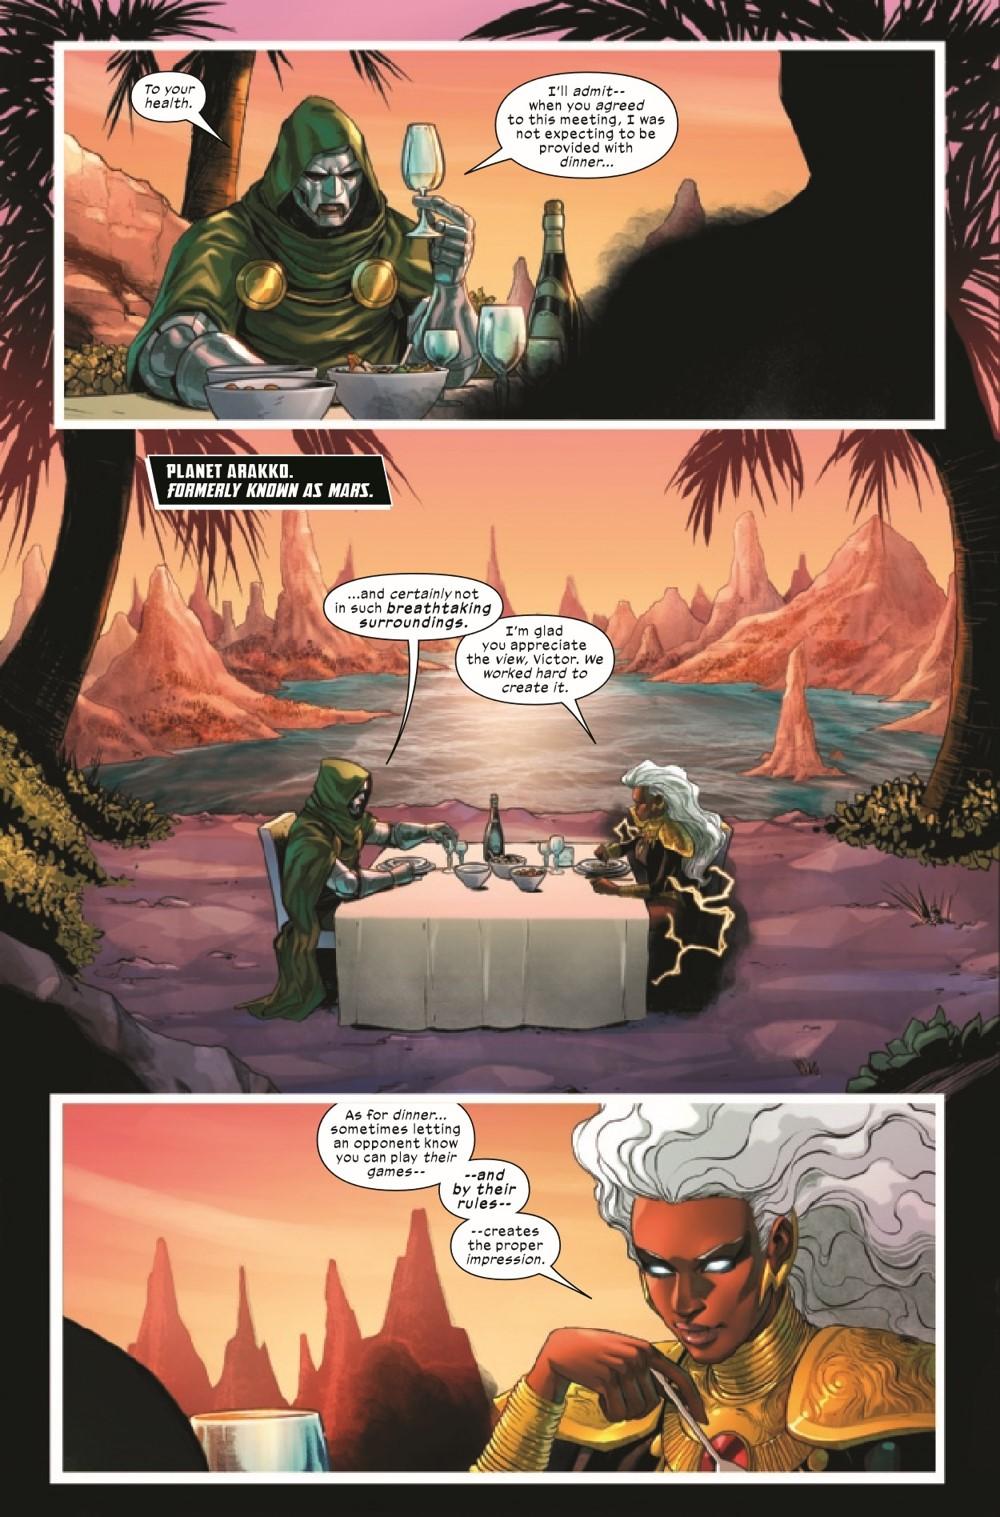 SWORD2020007_Preview-2 ComicList Previews: S.W.O.R.D. #7